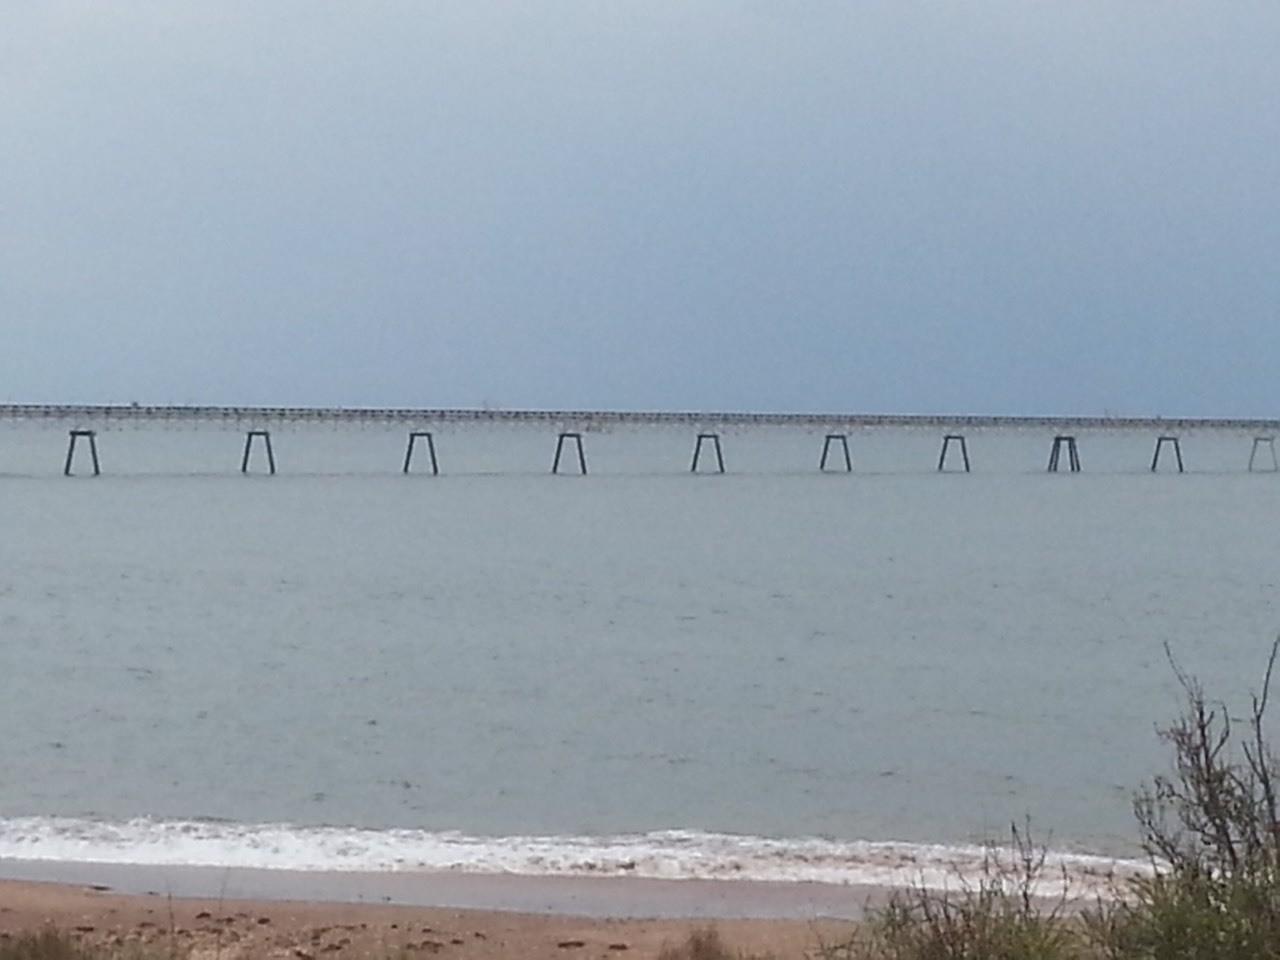 Salt jetty